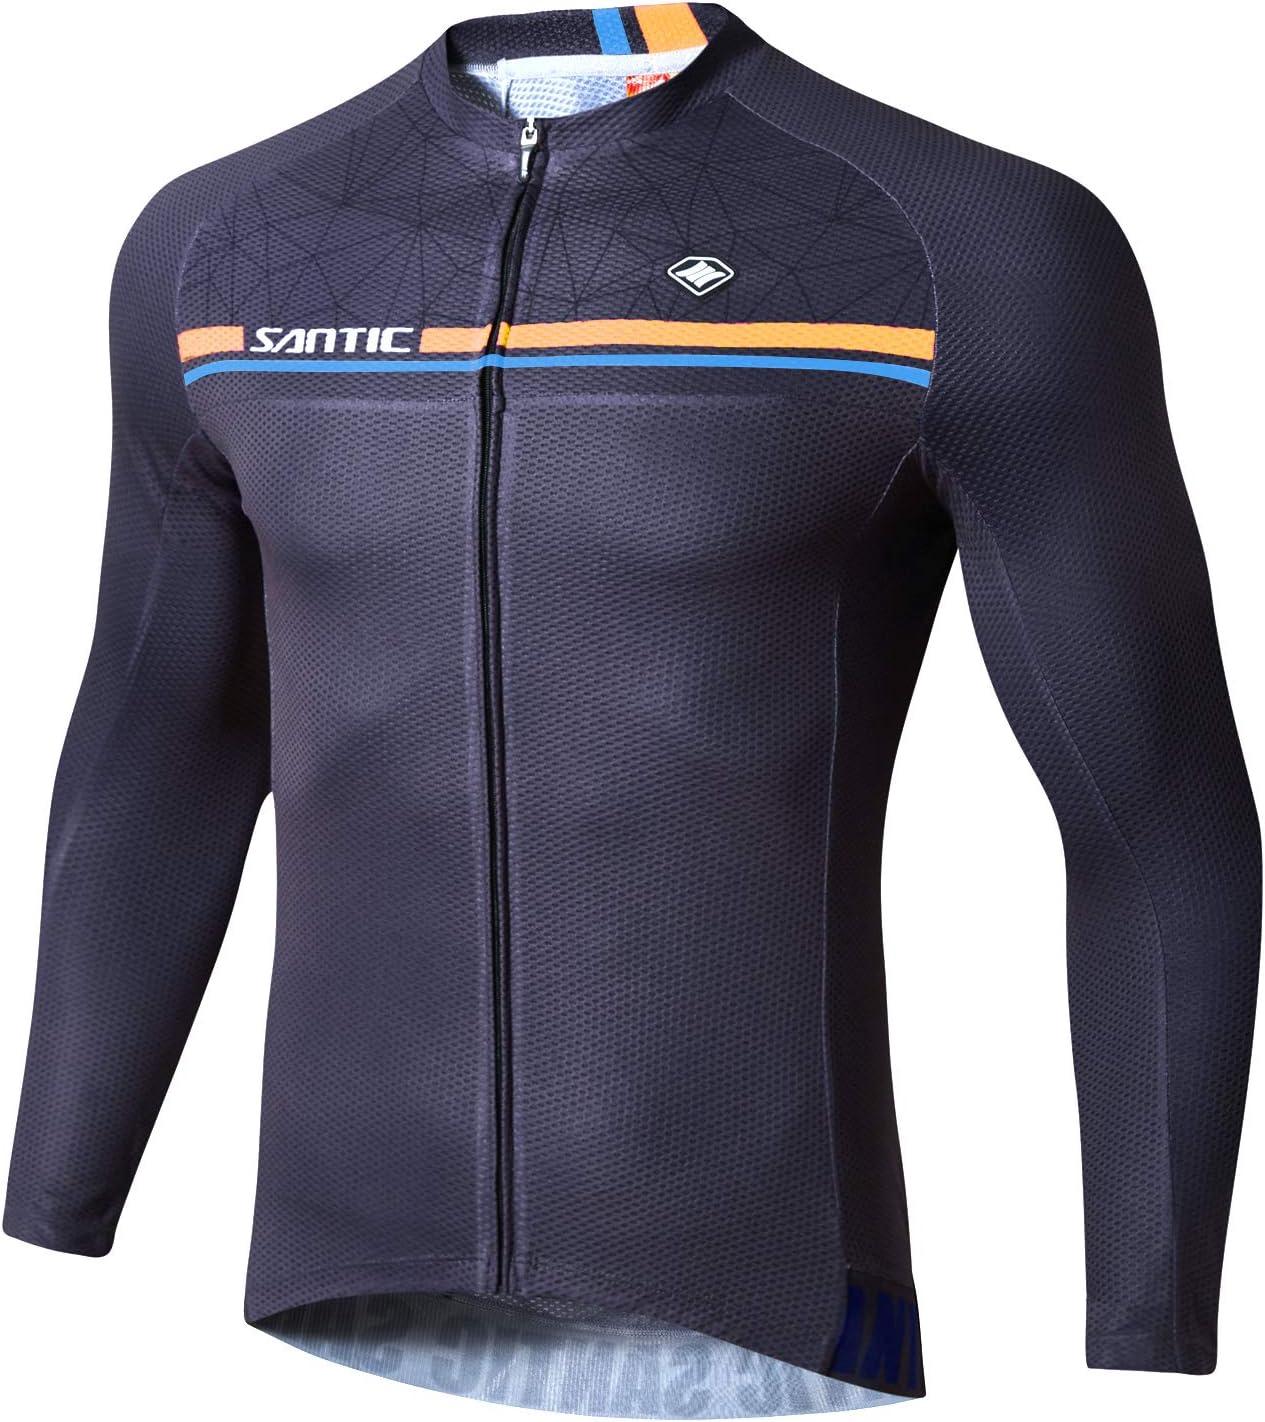 Santic Maillot Bicicleta Hombre Manga Larga MTB,Maillot Ciclismo Hombre Oto/ño//Invierno